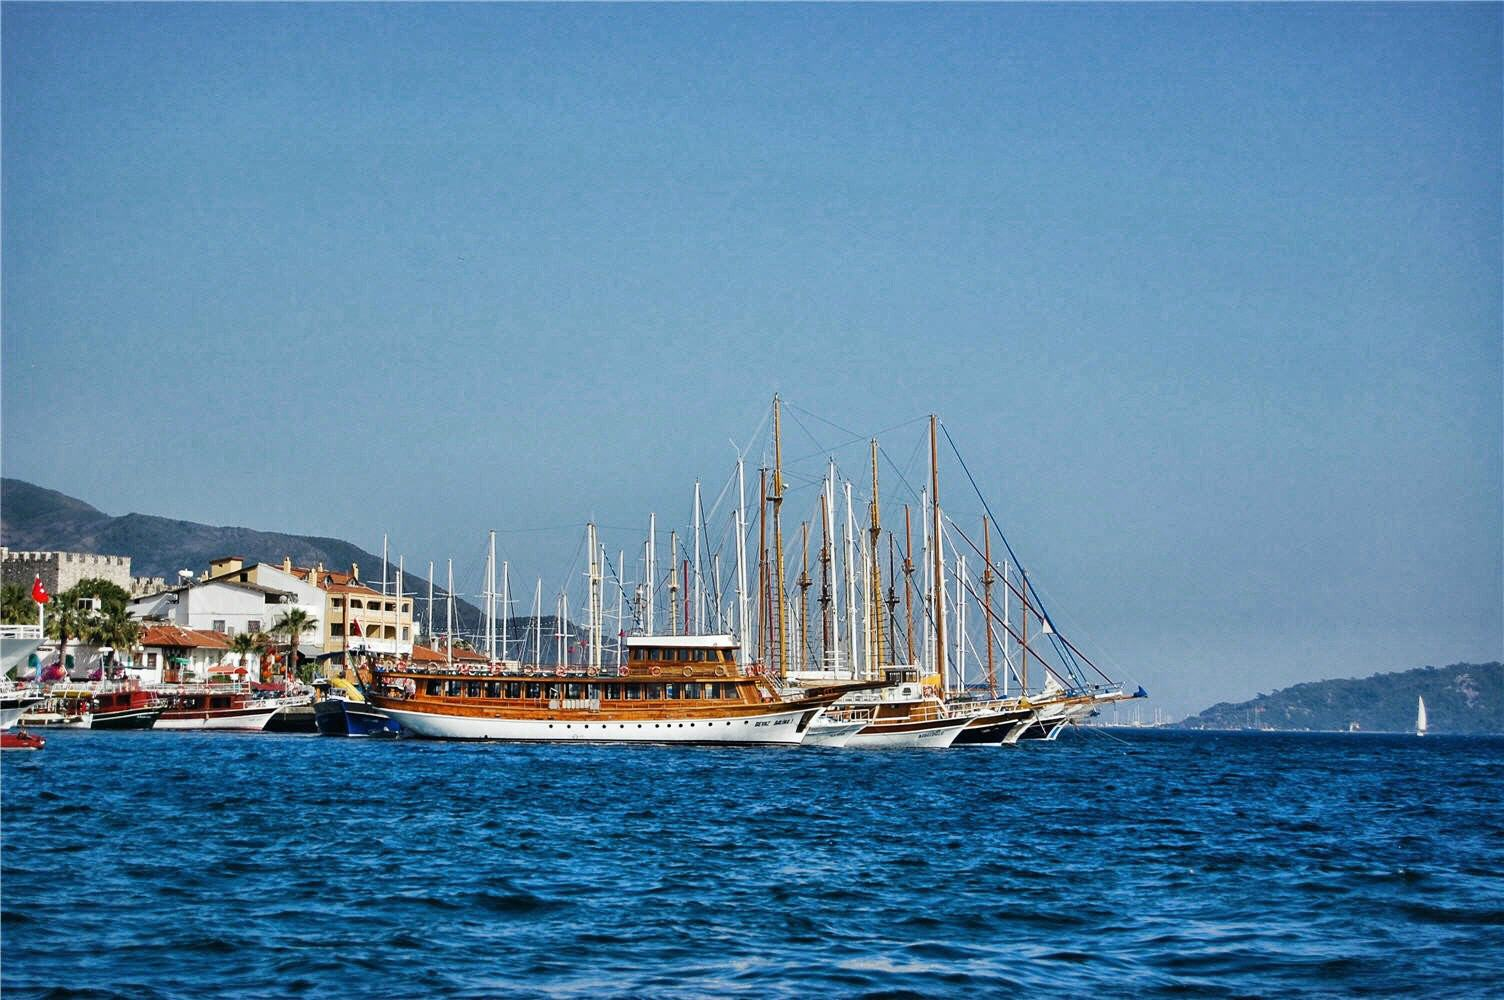 YachtsShips-22